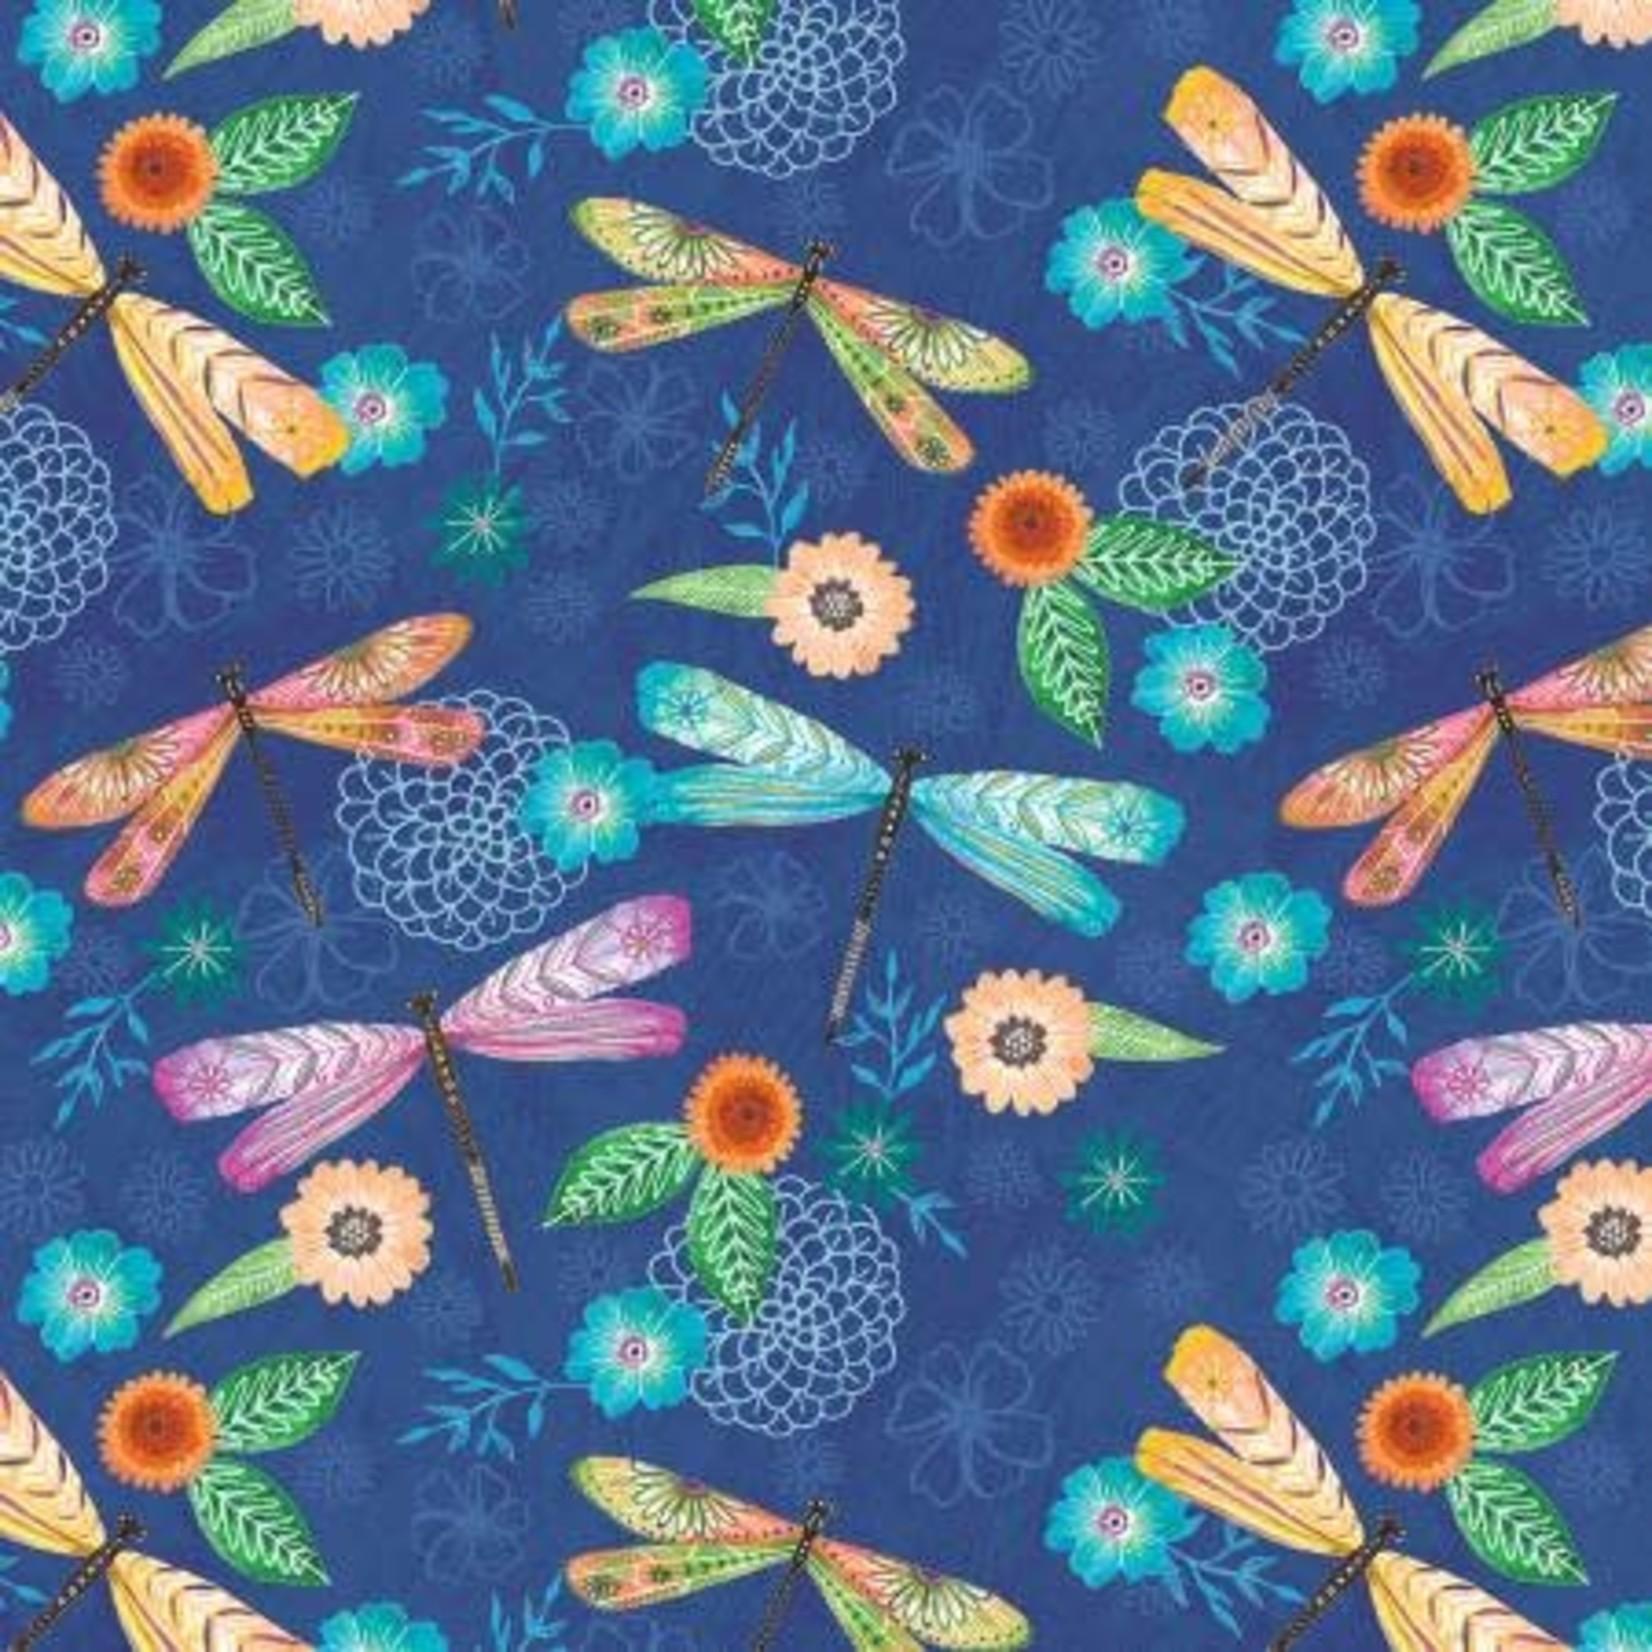 Wilmington Prints Floral Flight - Dragonfly Allover - Blue